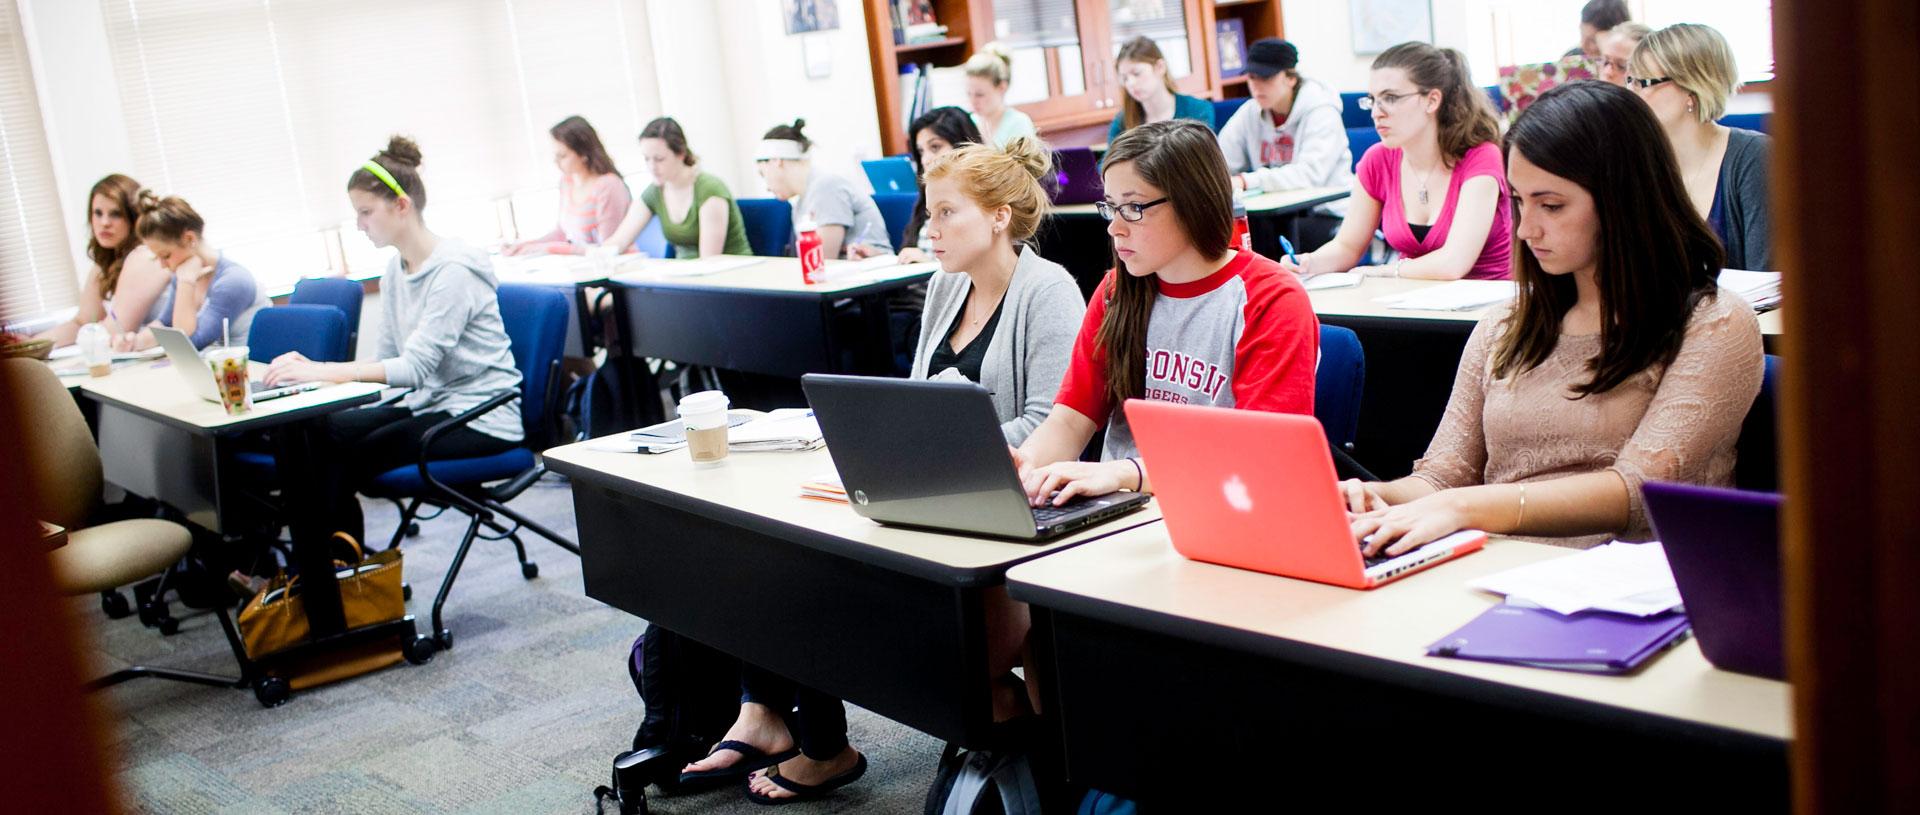 Undergrad students in Predolin classroom.